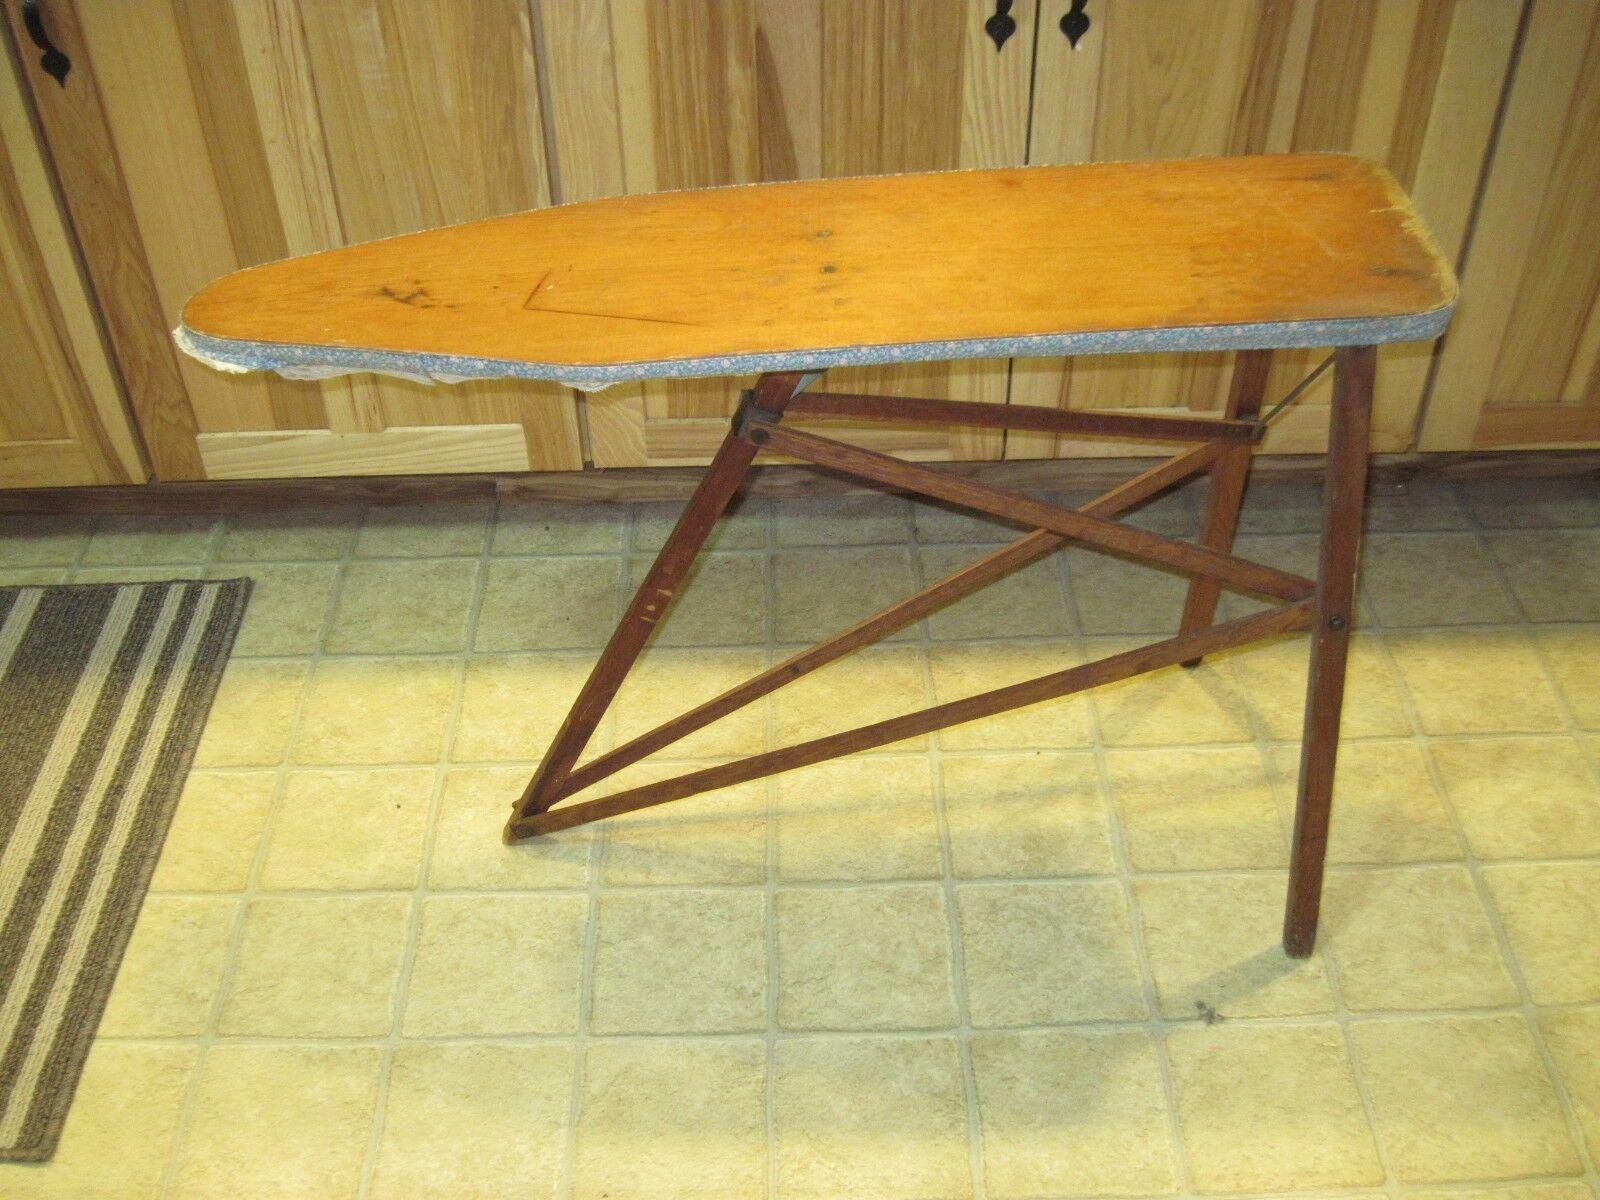 Antigüedades, juguetes infantiles, planchas, OVB usa Wood, nuestra mejor mesa, mesa, mesa, Saginaw mi. d33